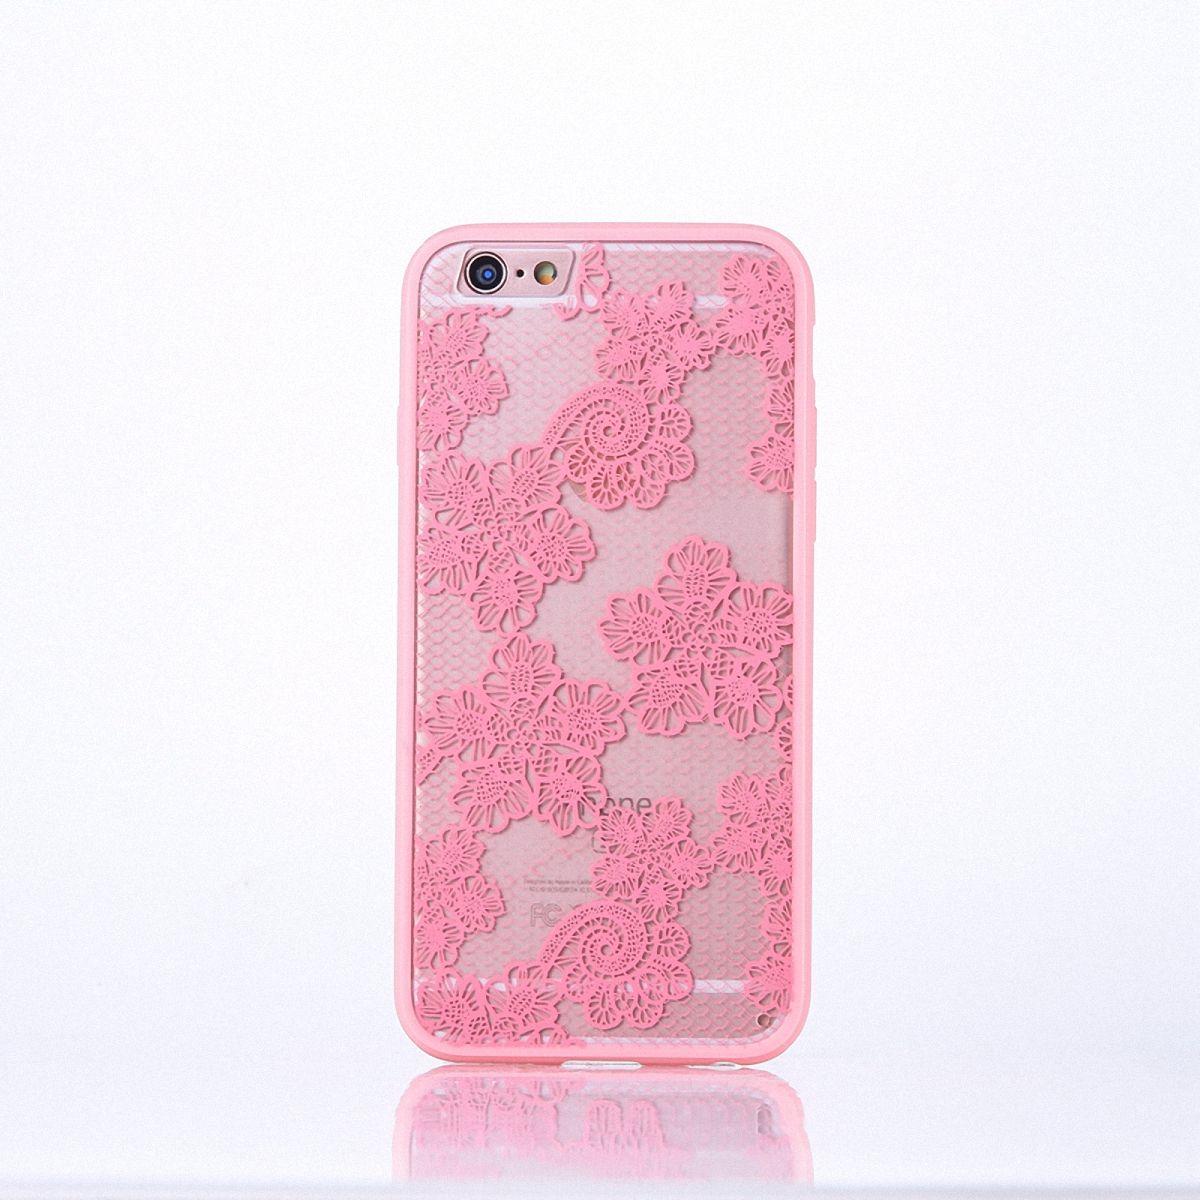 Handy Hülle Mandala für Apple iPhone 8 Plus Design Case Schutzhülle Motiv Blüten Cover Tasche Bumper Rosa